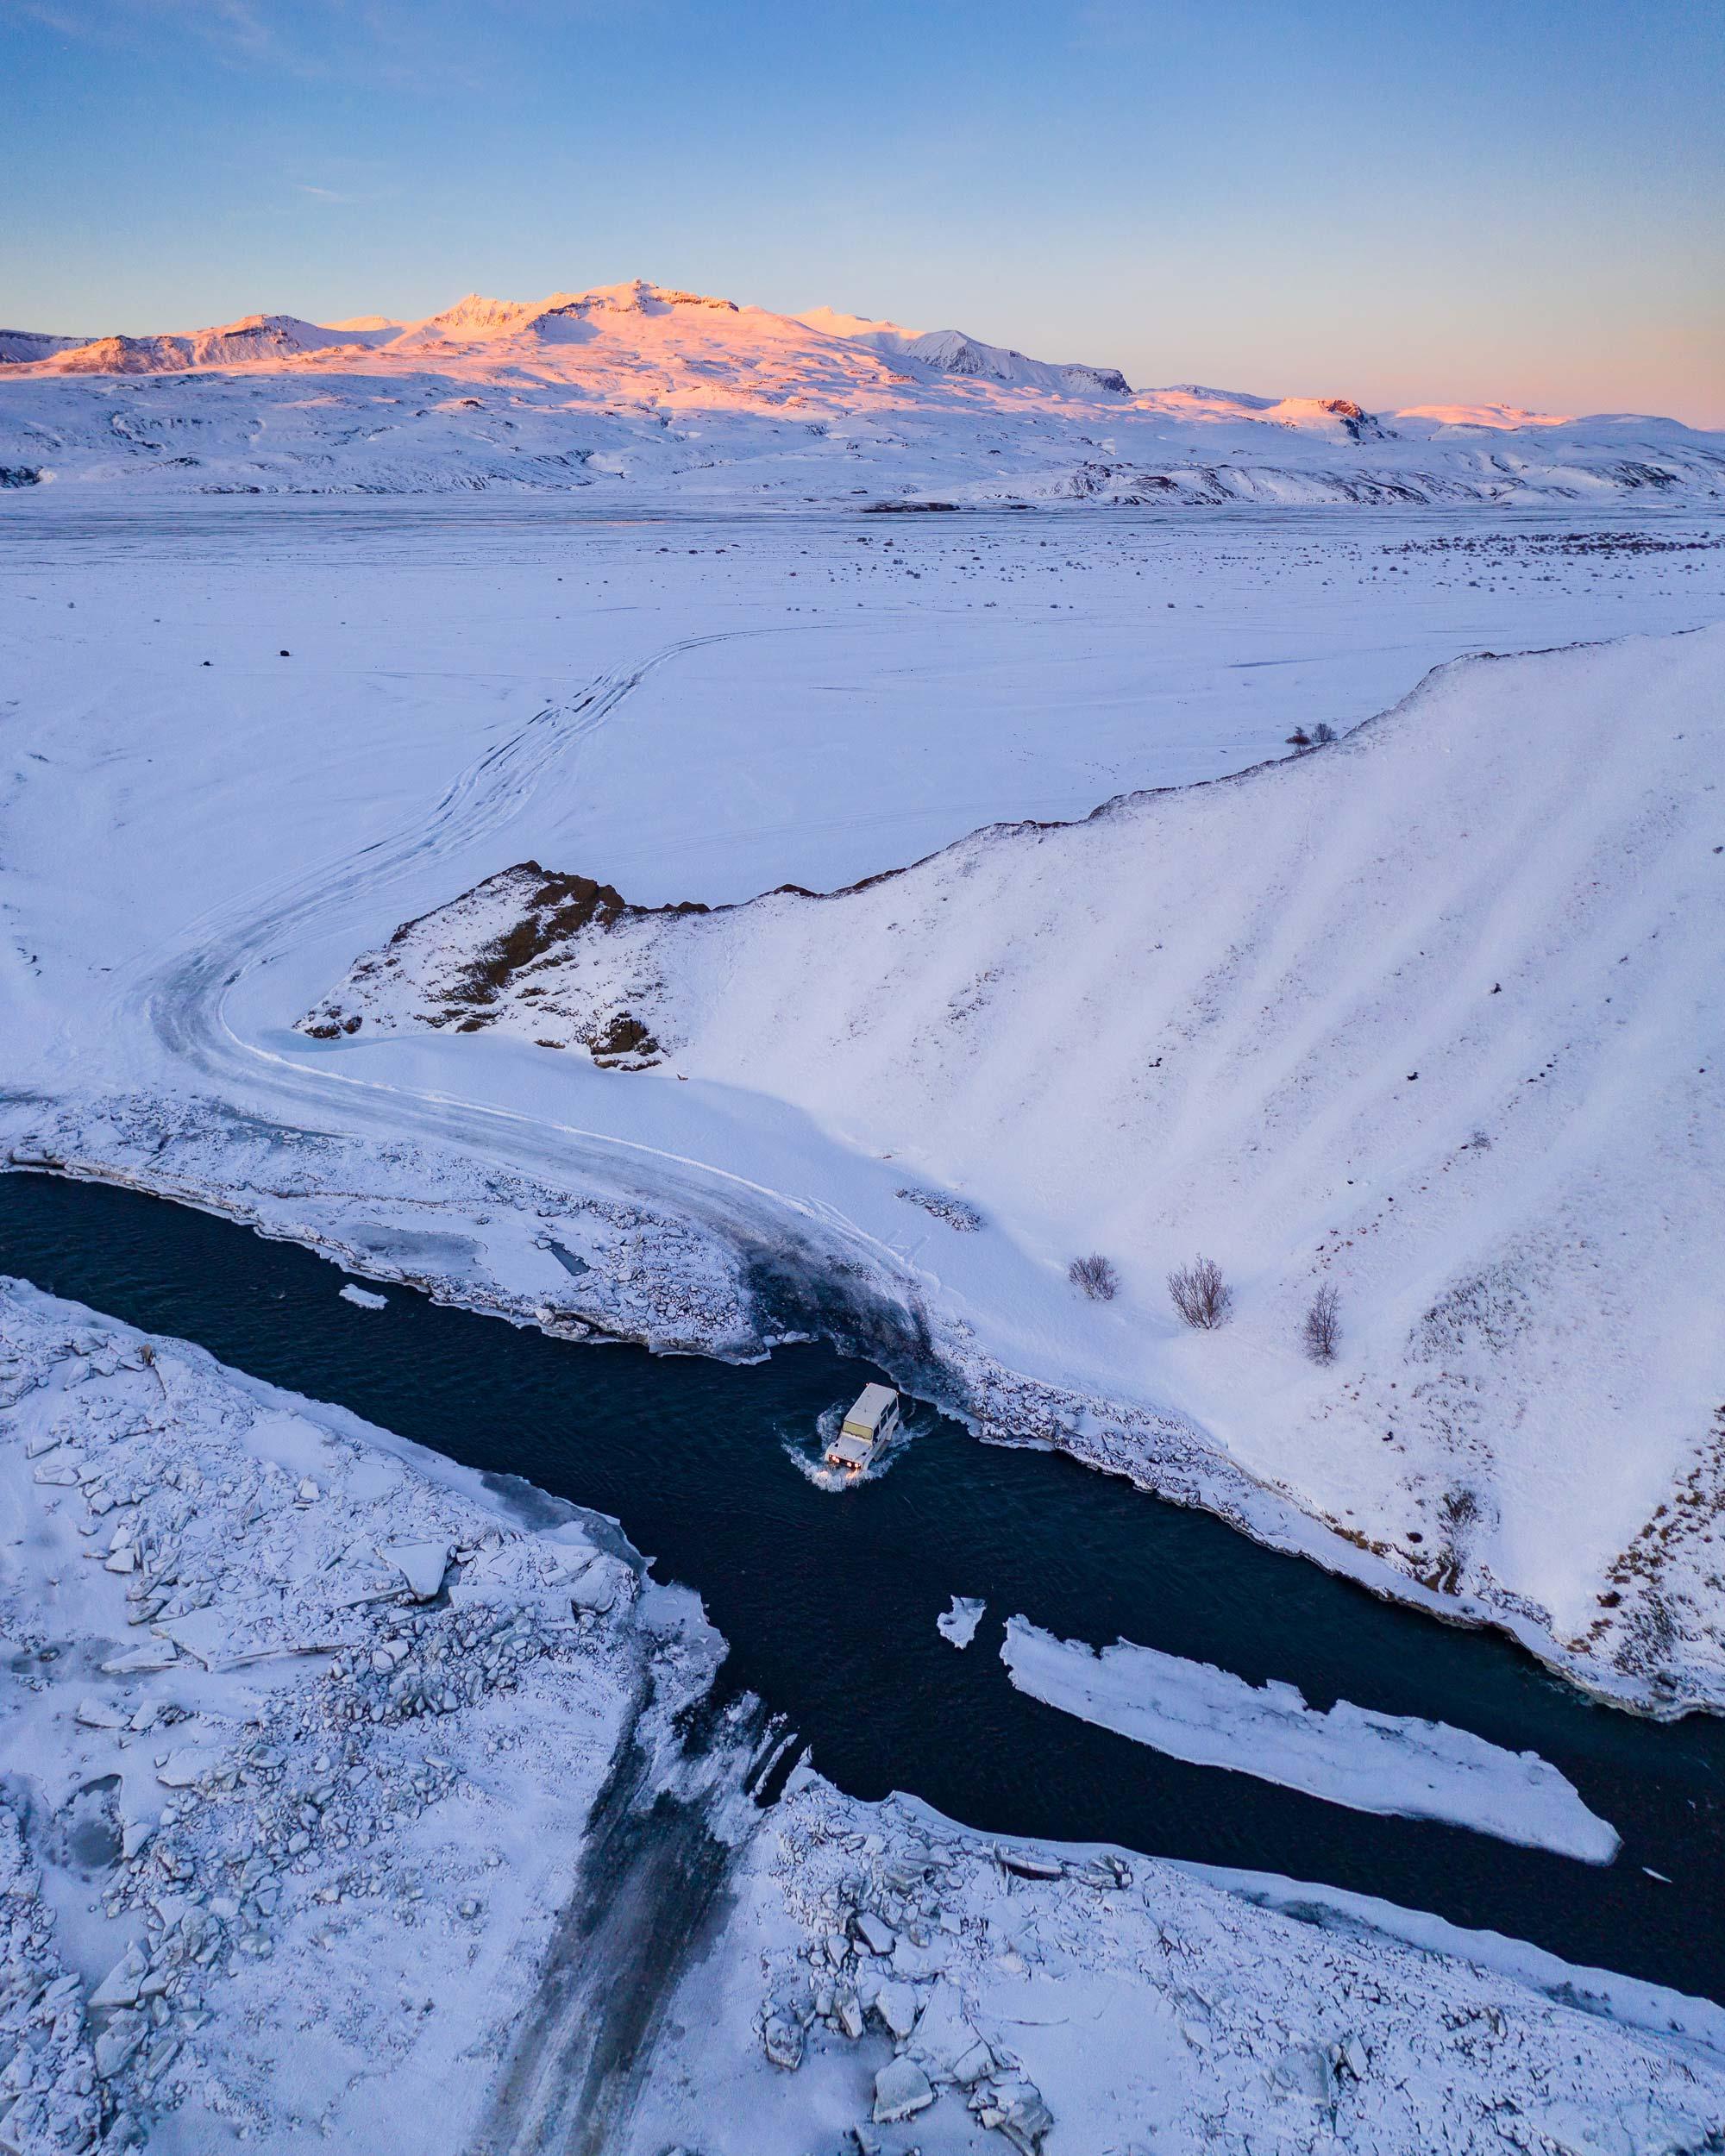 Copy of Snowy Þórsmörk